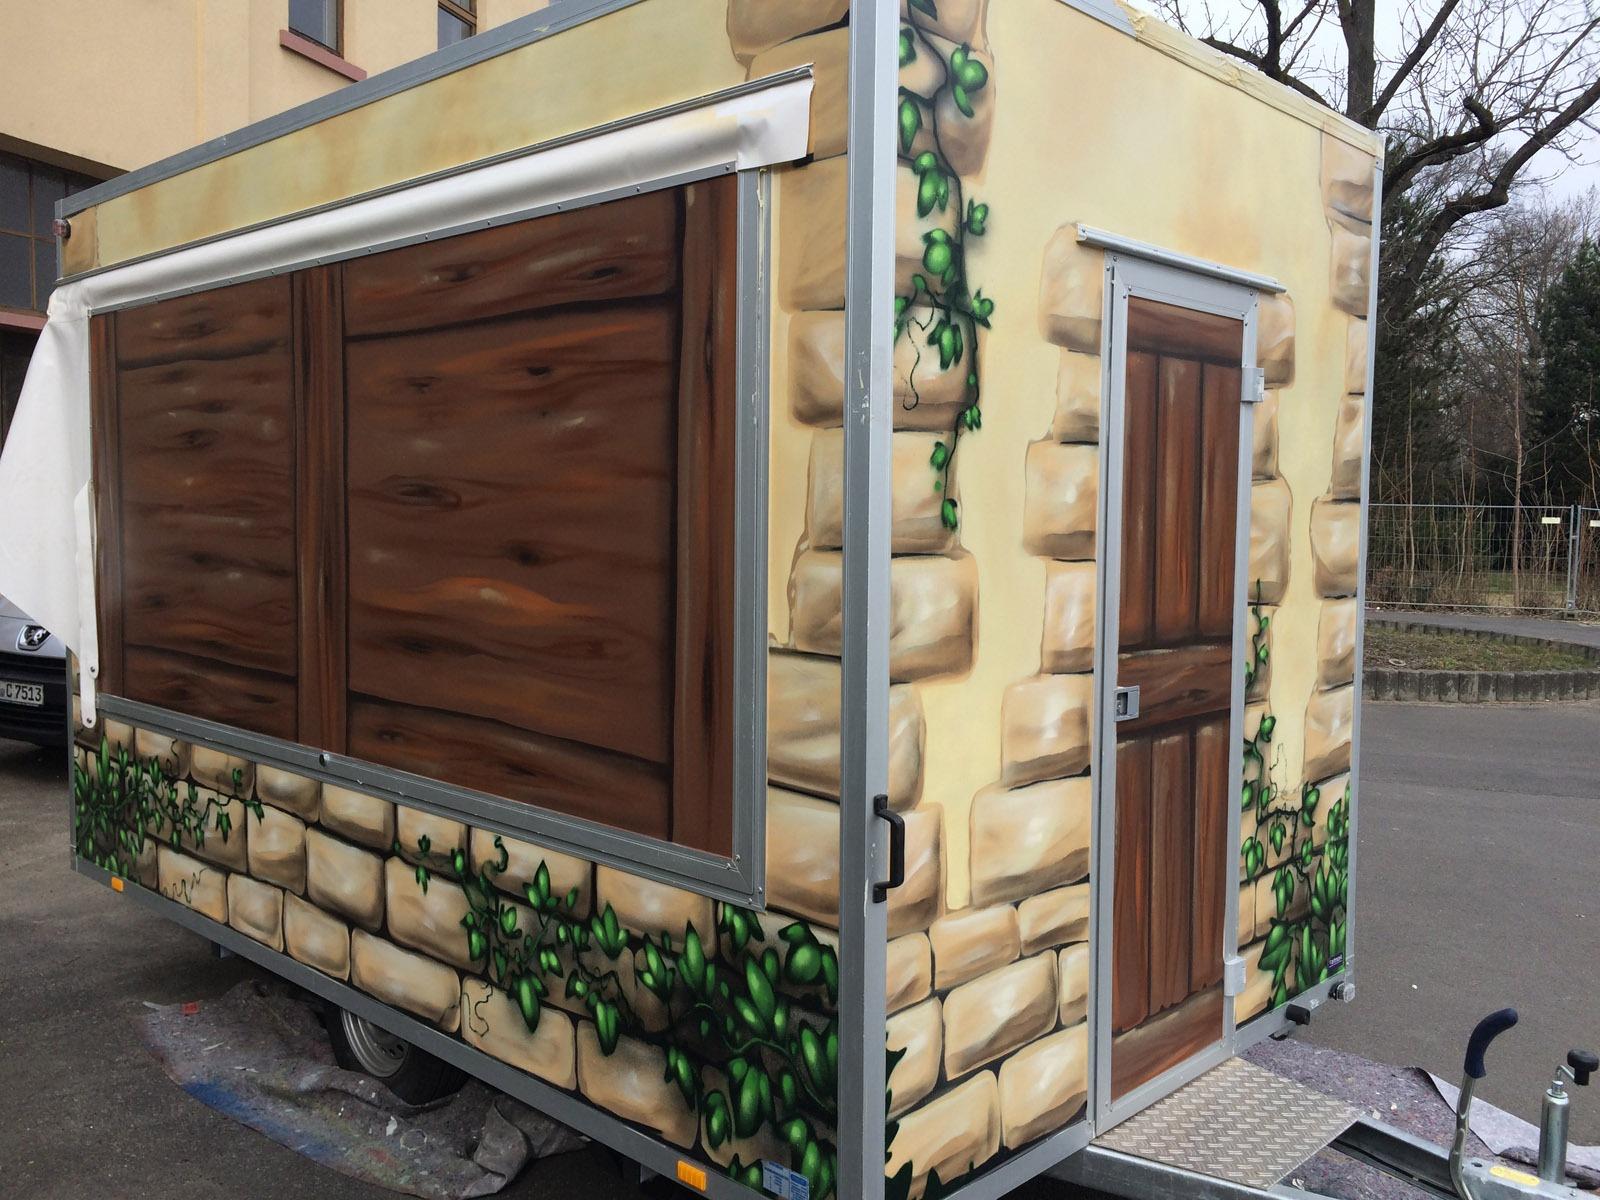 graffitiauftrag-graffitikuenstler-artmos4-creperia-laura-anhaenger-2015-fahrzeug-mauer-pflanzen-holz-logo-schrift-objekt-beige-braun-illustrtativ